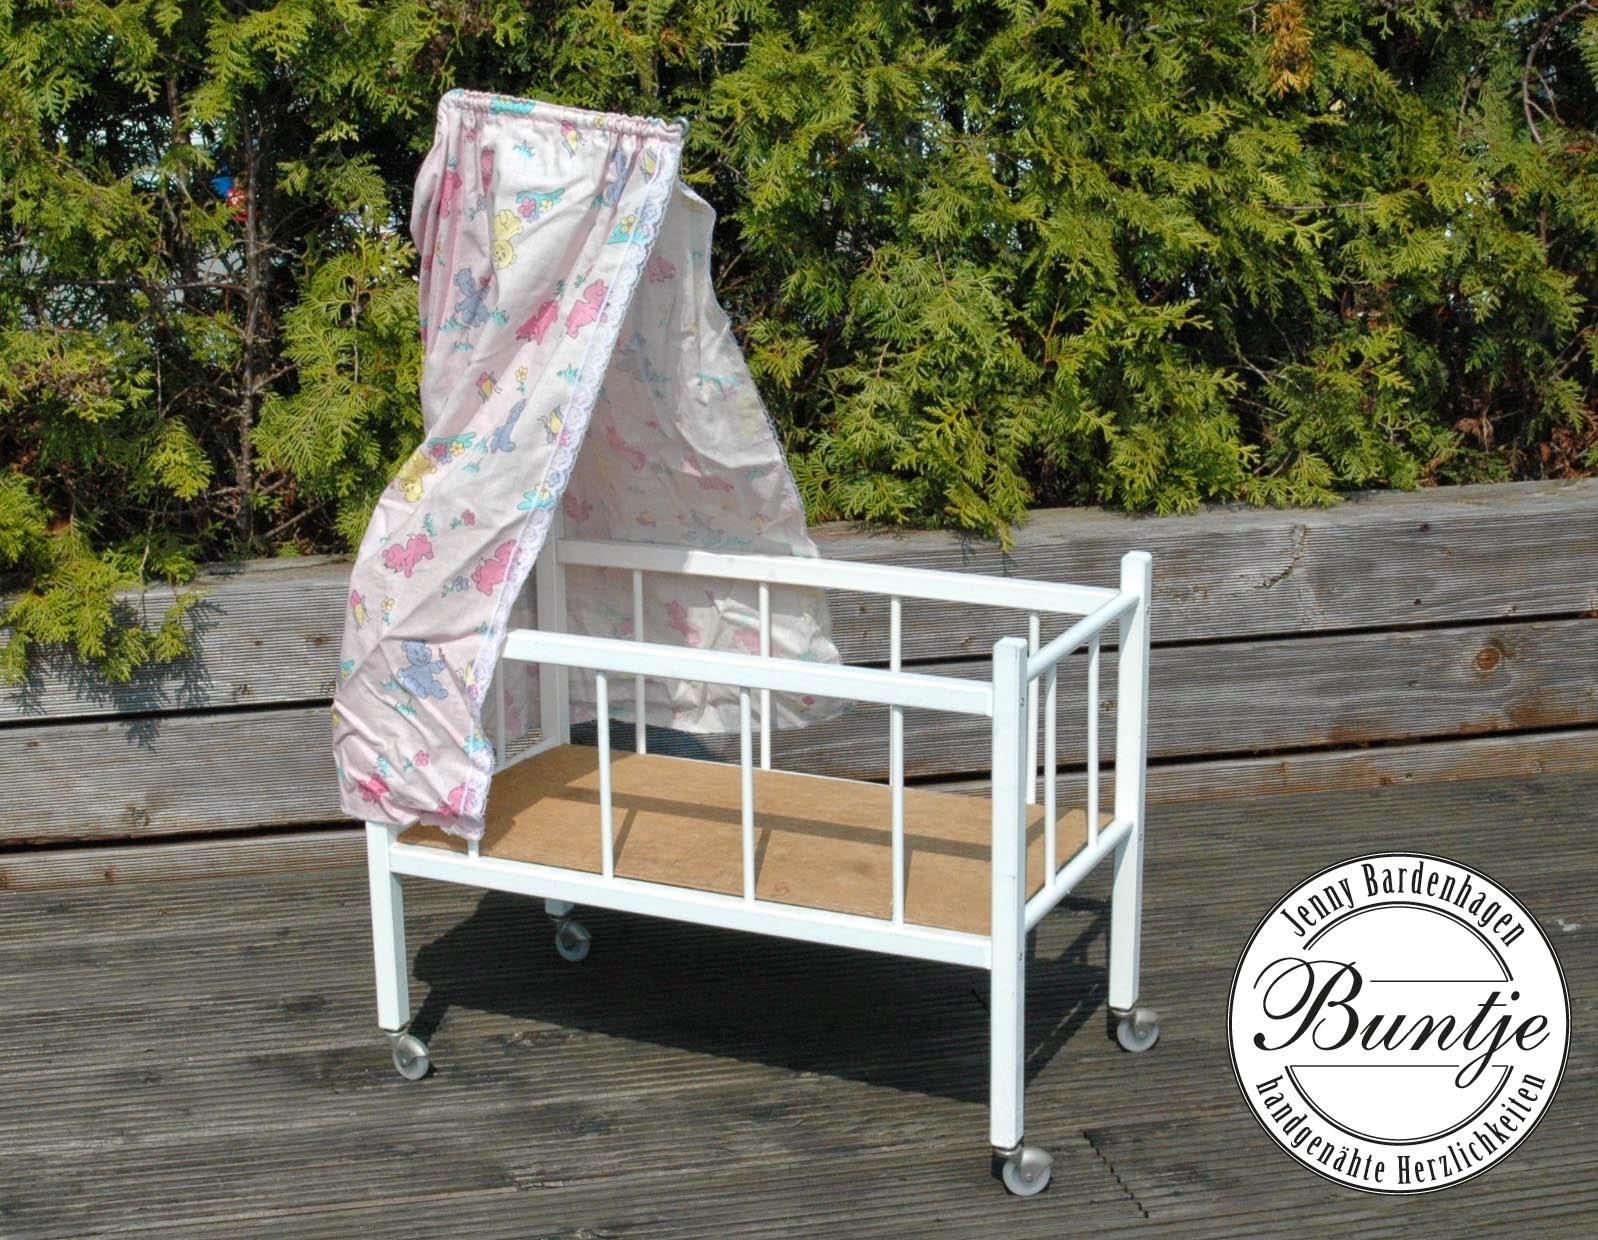 wo kann man alte bettdecken entsorgen. Black Bedroom Furniture Sets. Home Design Ideas